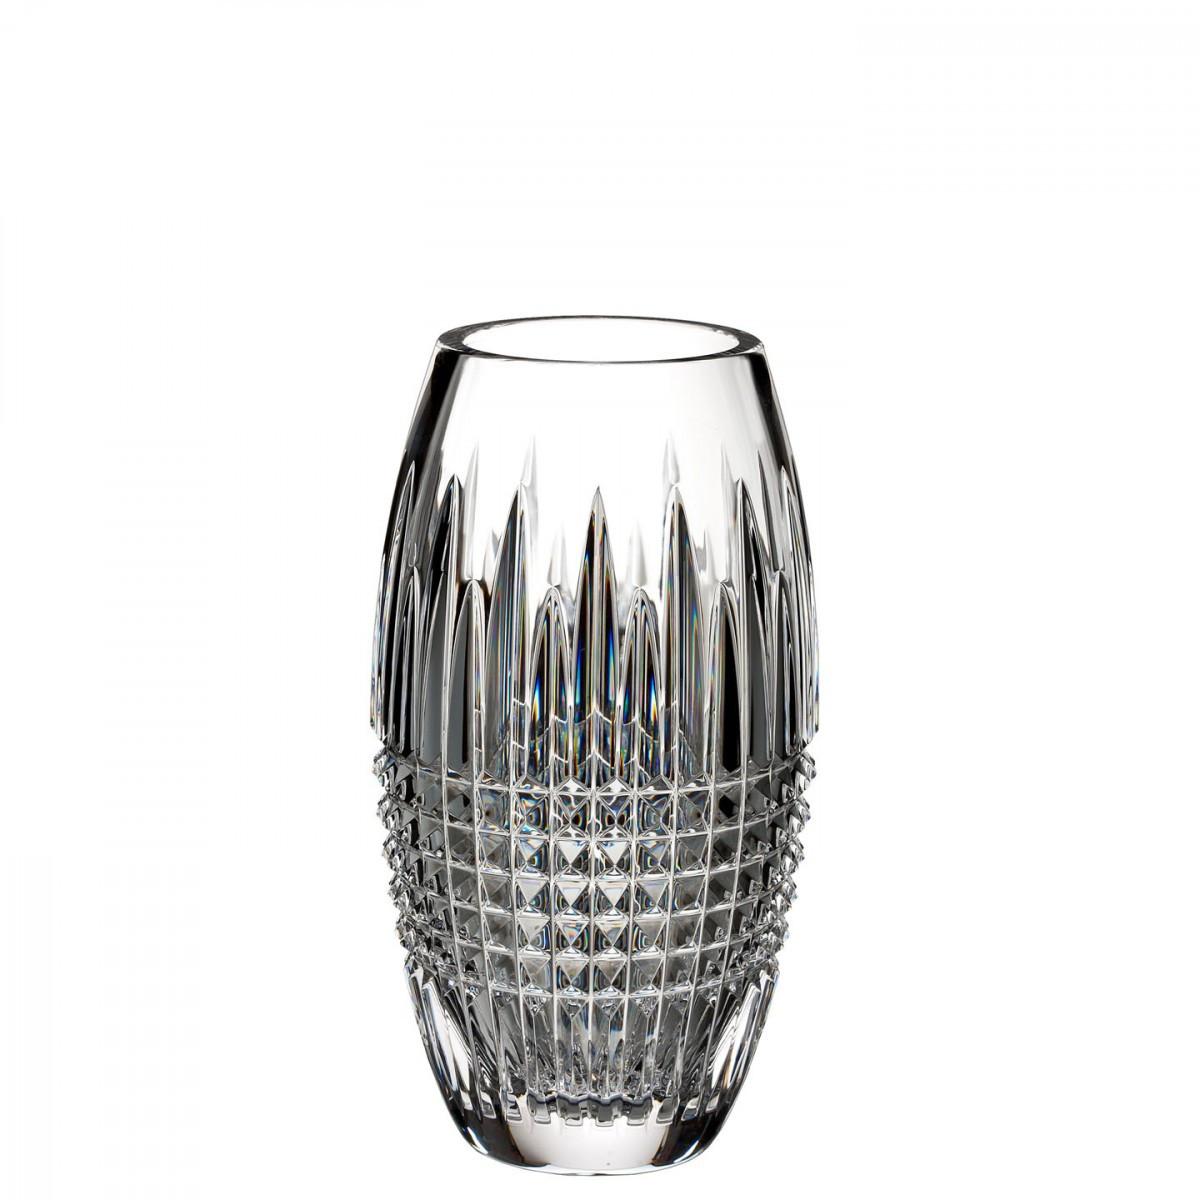 waterford lismore diamond 8 vase of lismore diamond encore vase 20cm waterforda crystal regarding lismore diamond encore vase 20cm